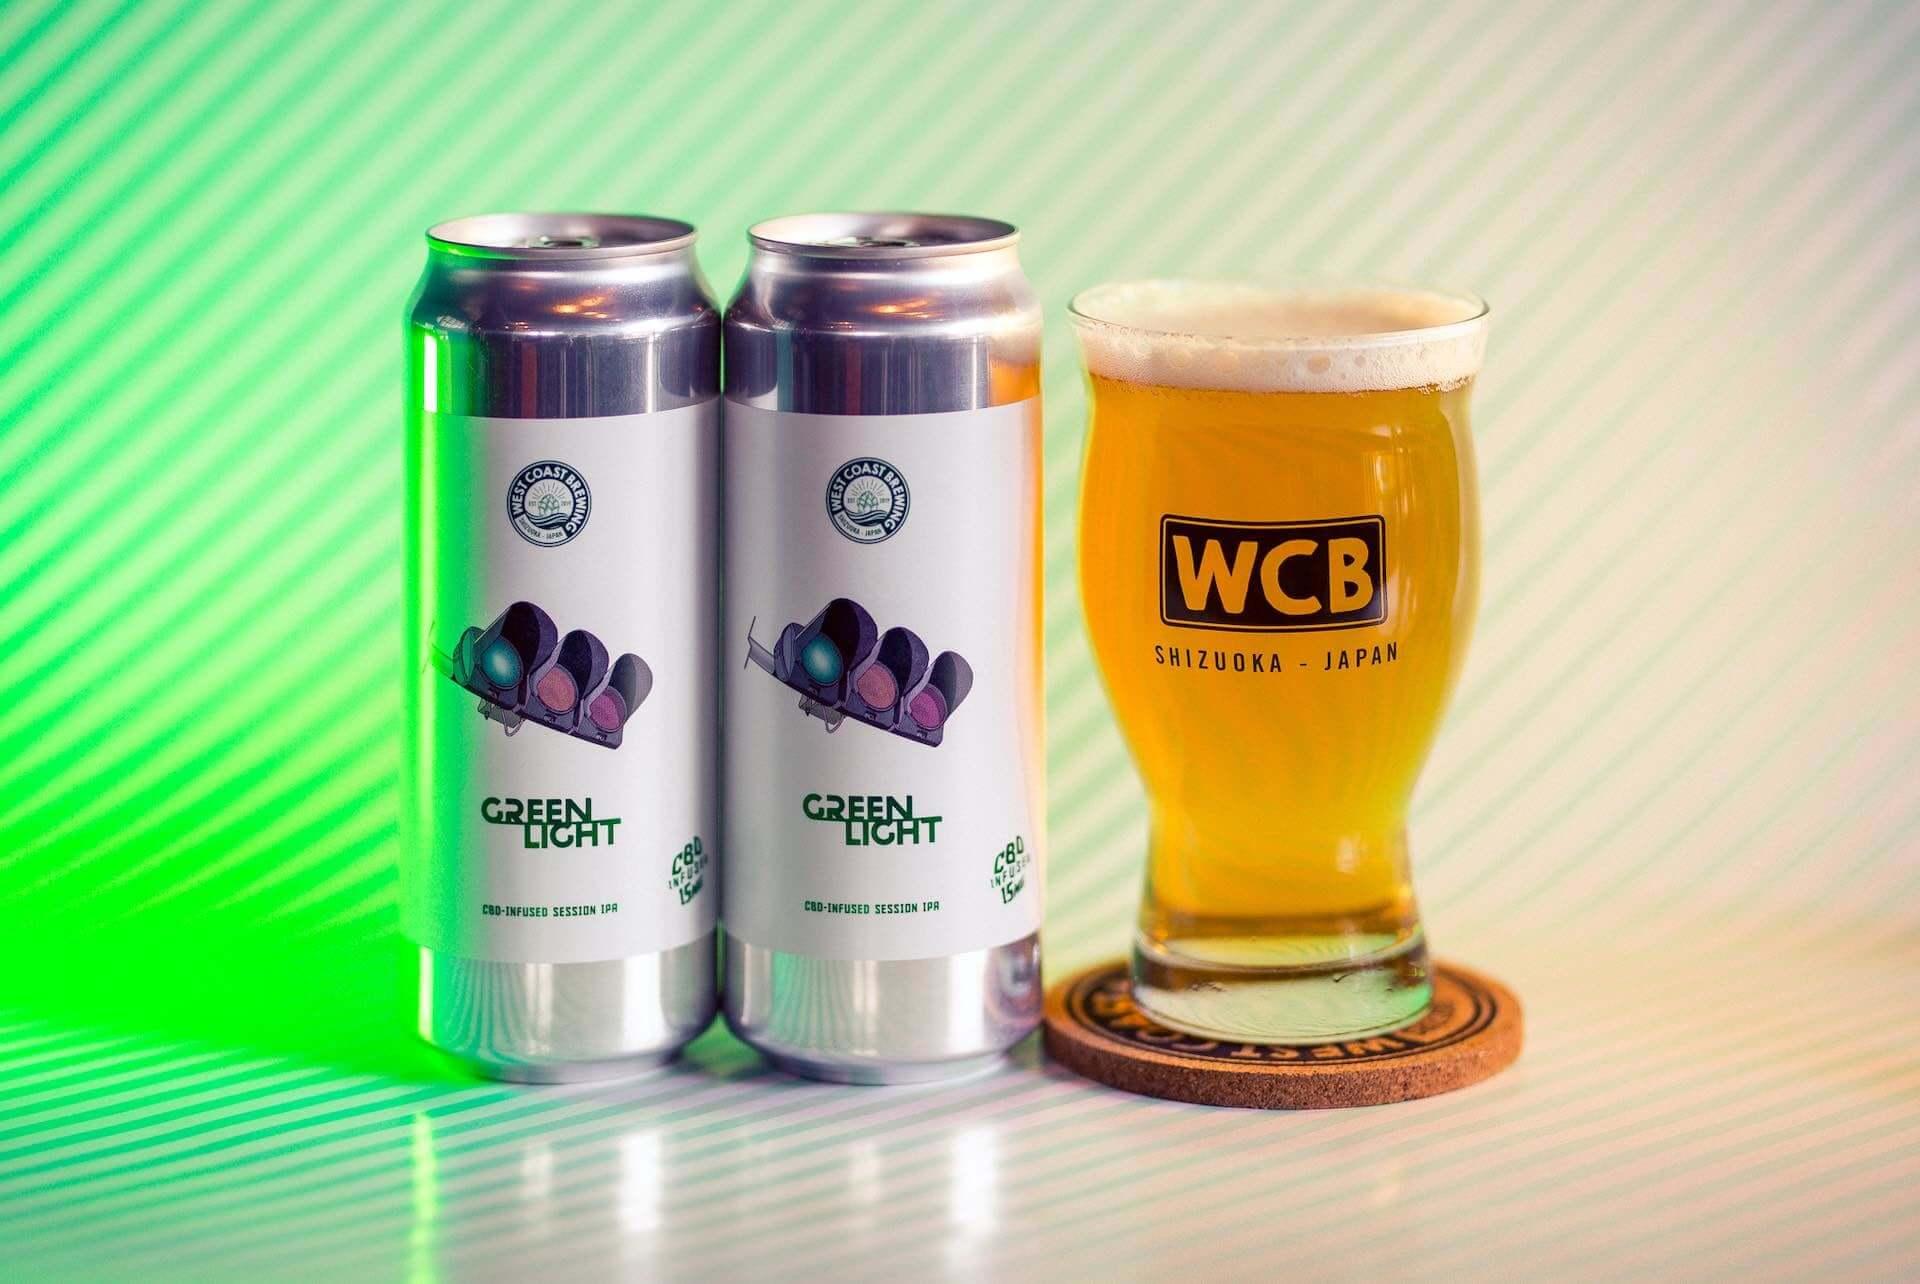 CBD入りクラフトビール『Starwatcher CBD』と『Green Light』がWest Coast Brewingより発売!香り豊かなIPAを採用 gourmet210302_westcoastbrewing_6-1920x1284